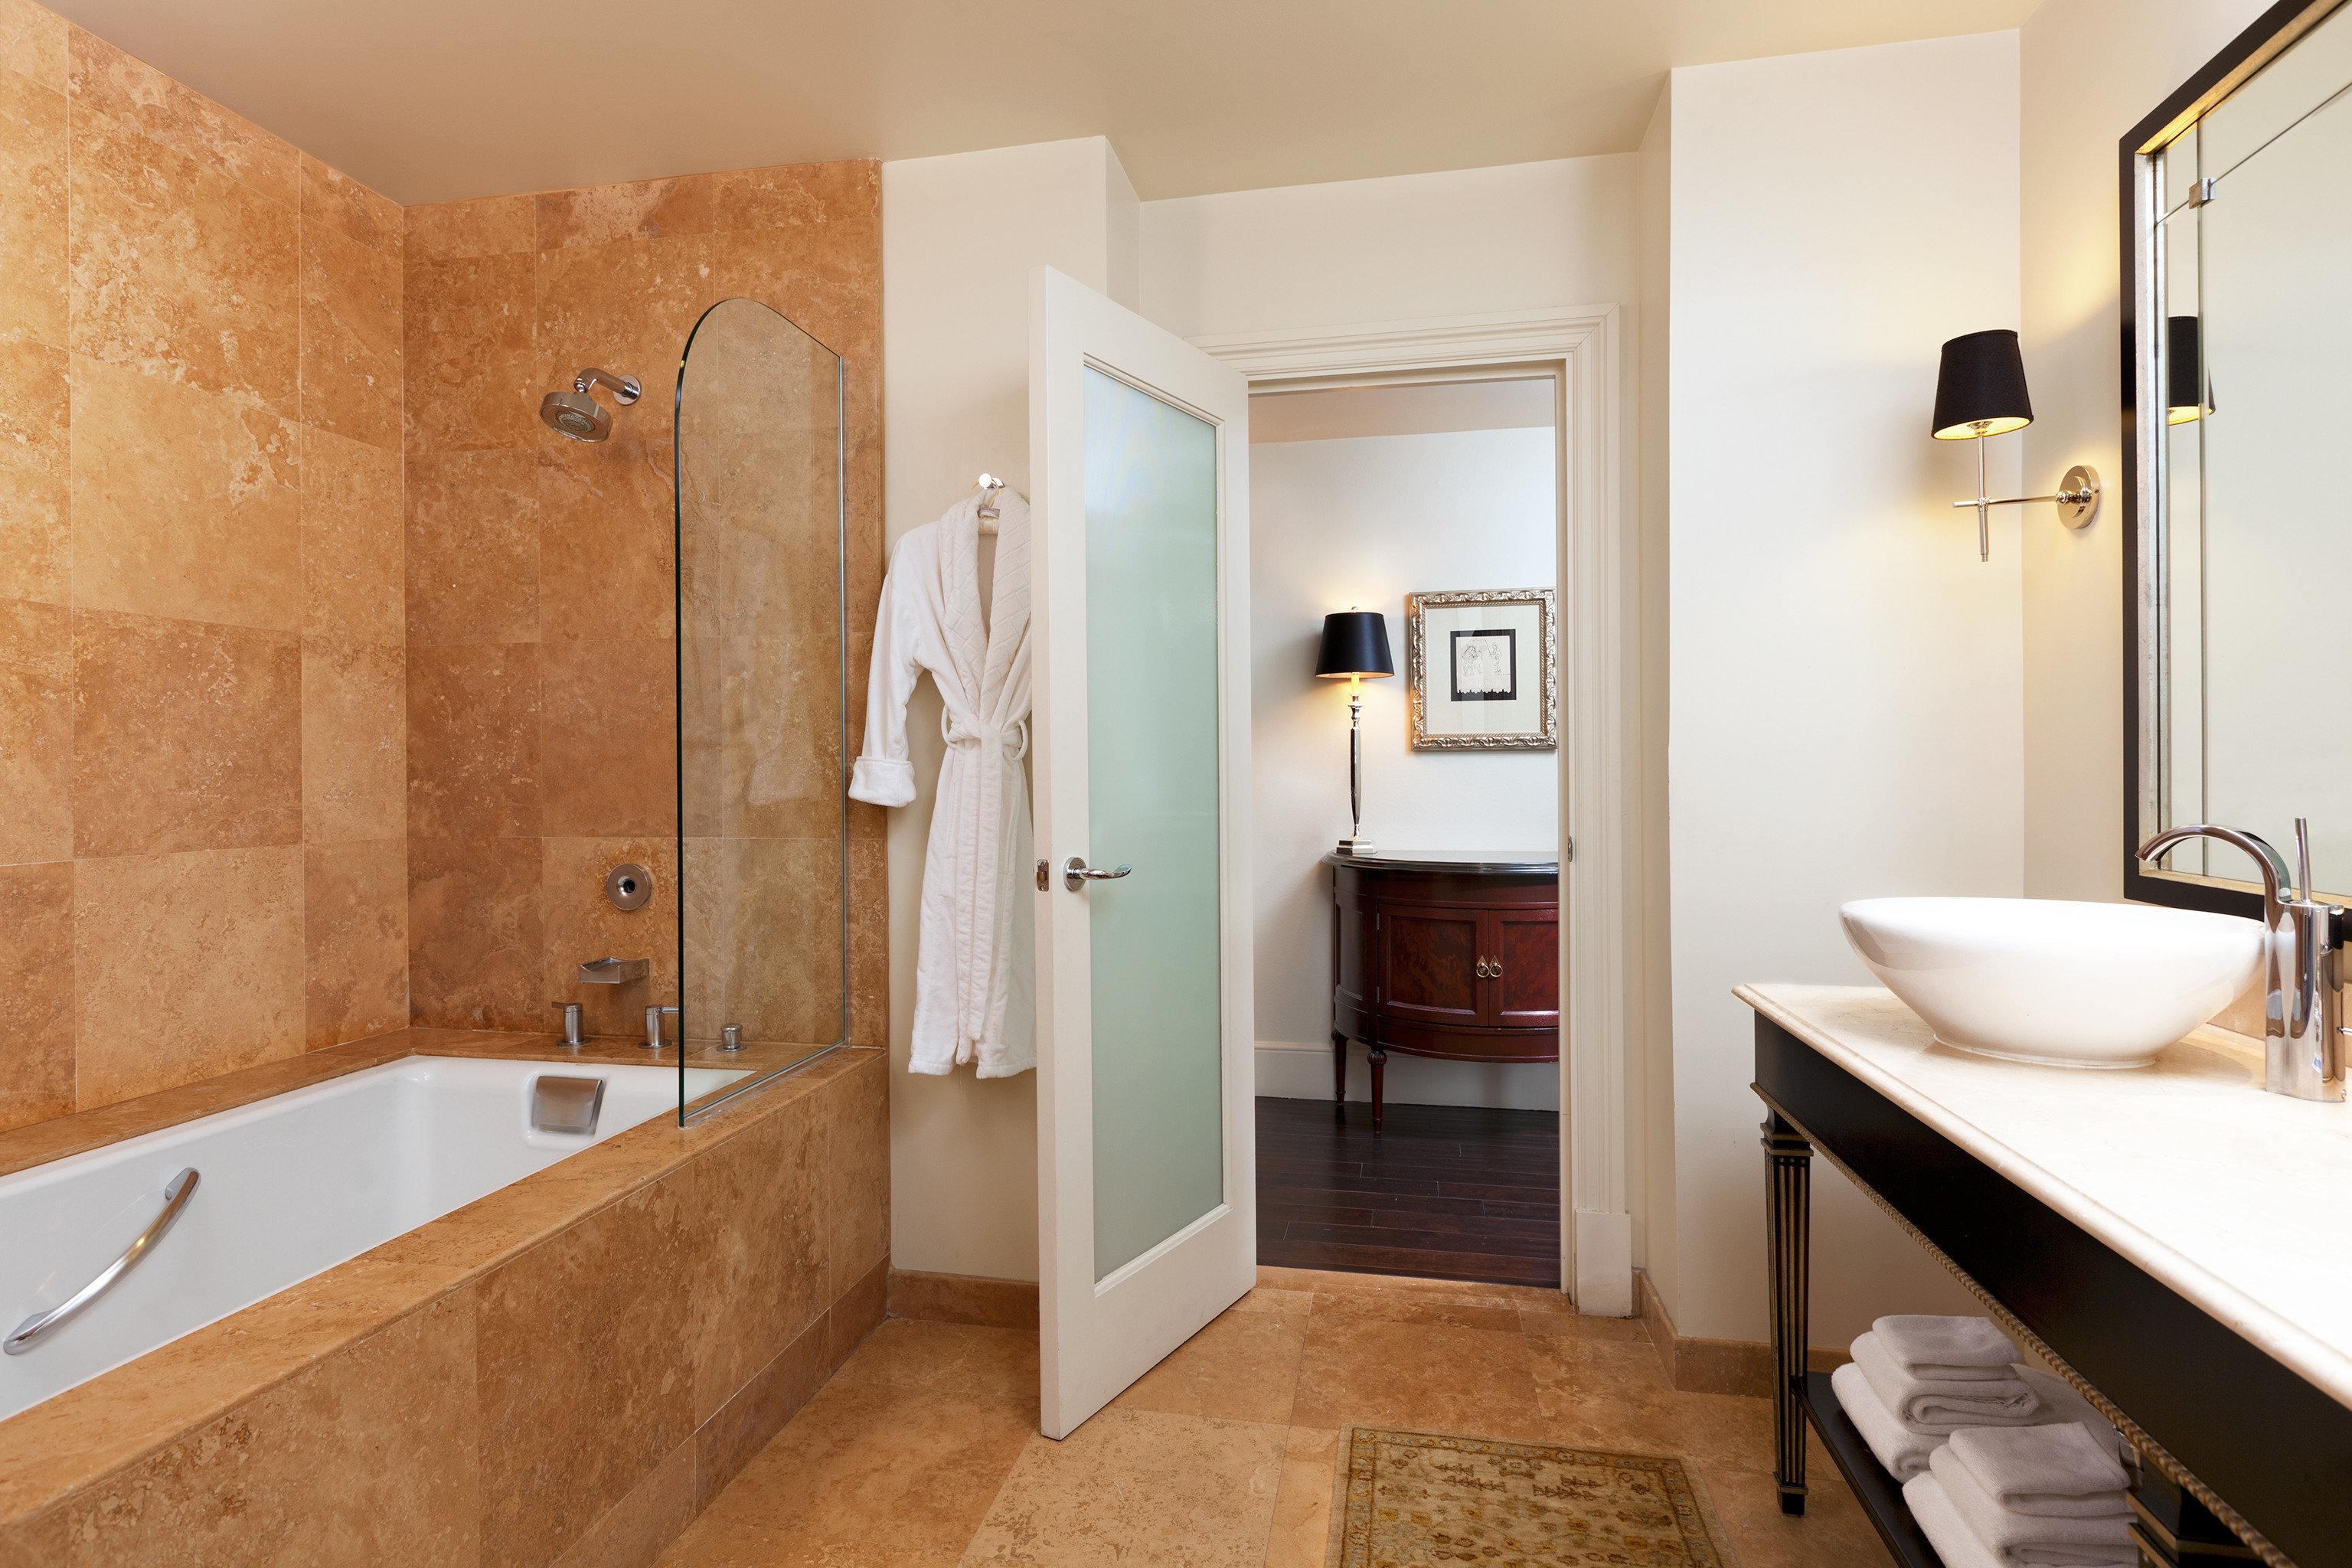 Bath Luxury bathroom property sink Suite home flooring plumbing fixture cottage tan Modern tub bathtub